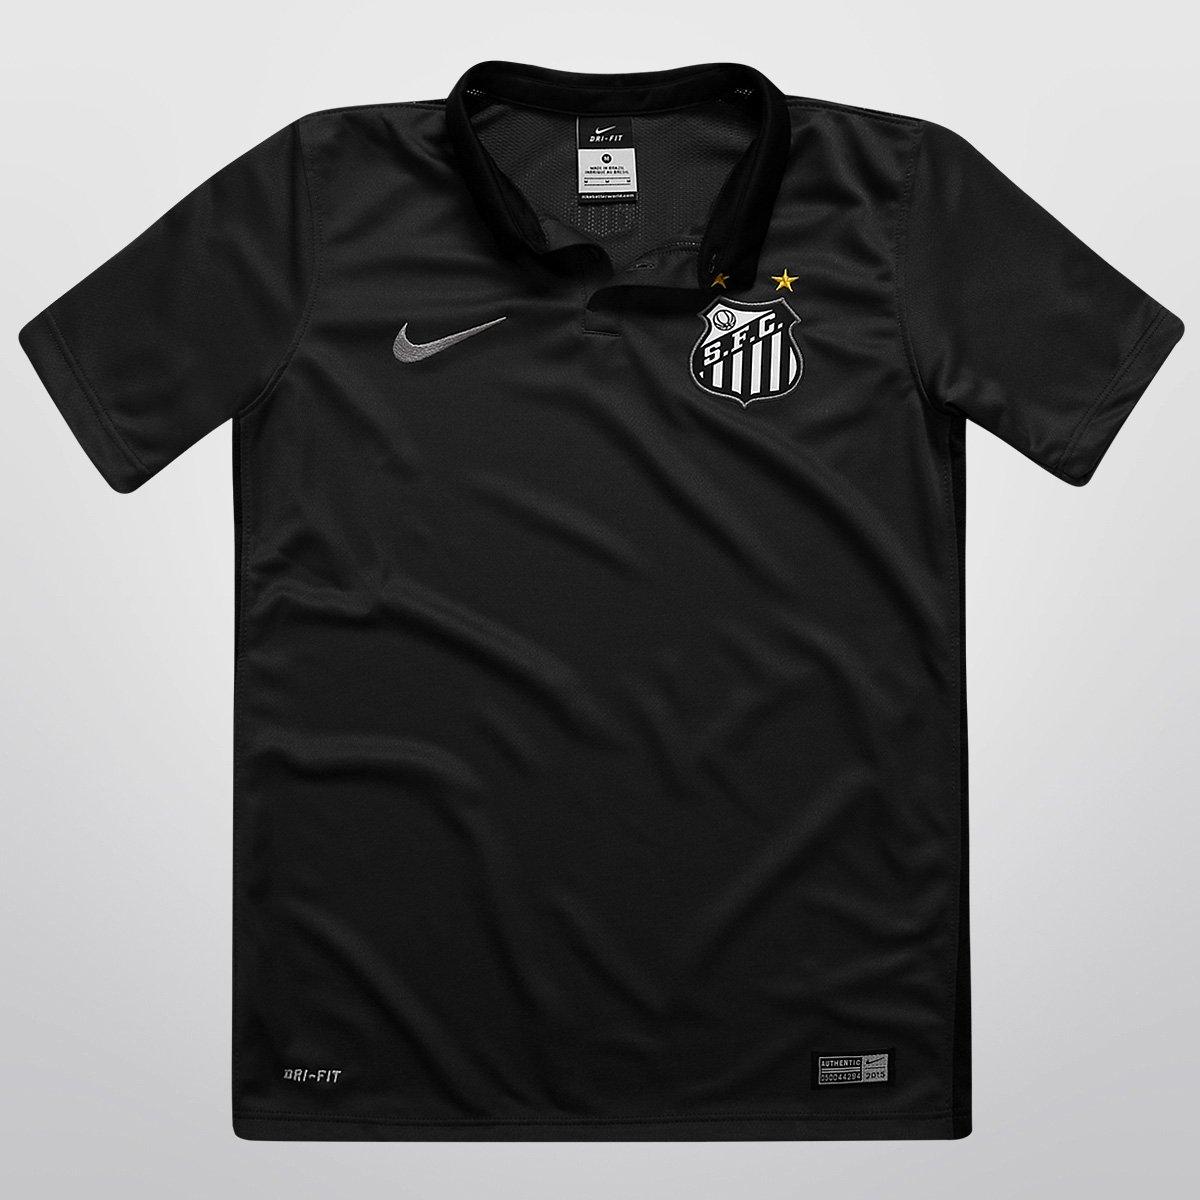 Camisa Nike Santos III 2015 s nº Infantil - Compre Agora  7611aff3a1d06